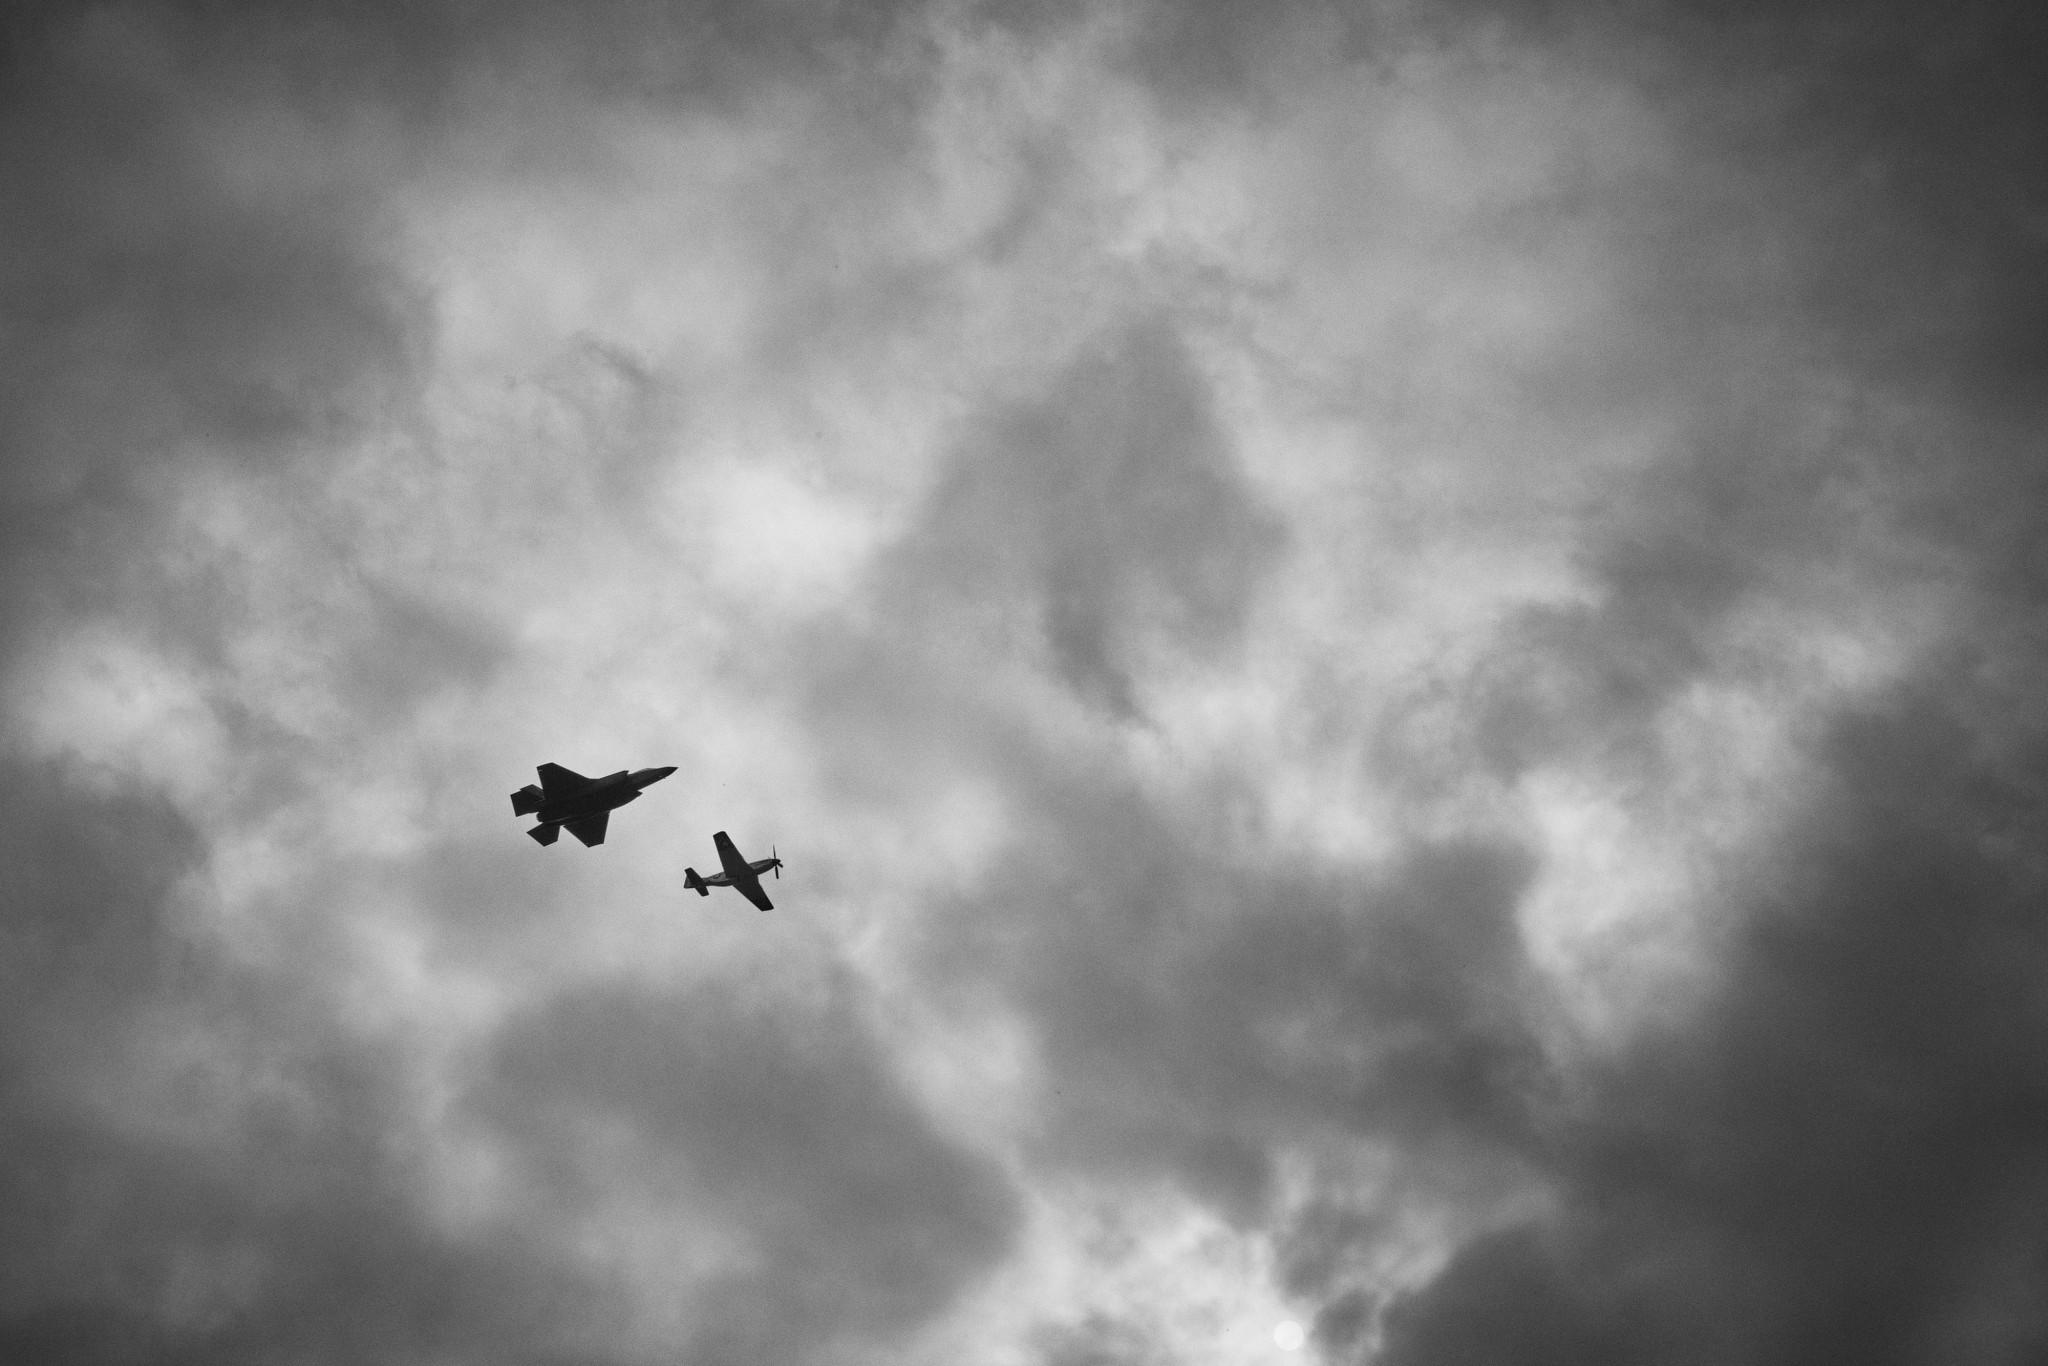 USAF Heritage Flight (P-51 Val Halla / F-35A) - Greg Anders, LTC (Retired) / Capt. Andrew Dojo Olson